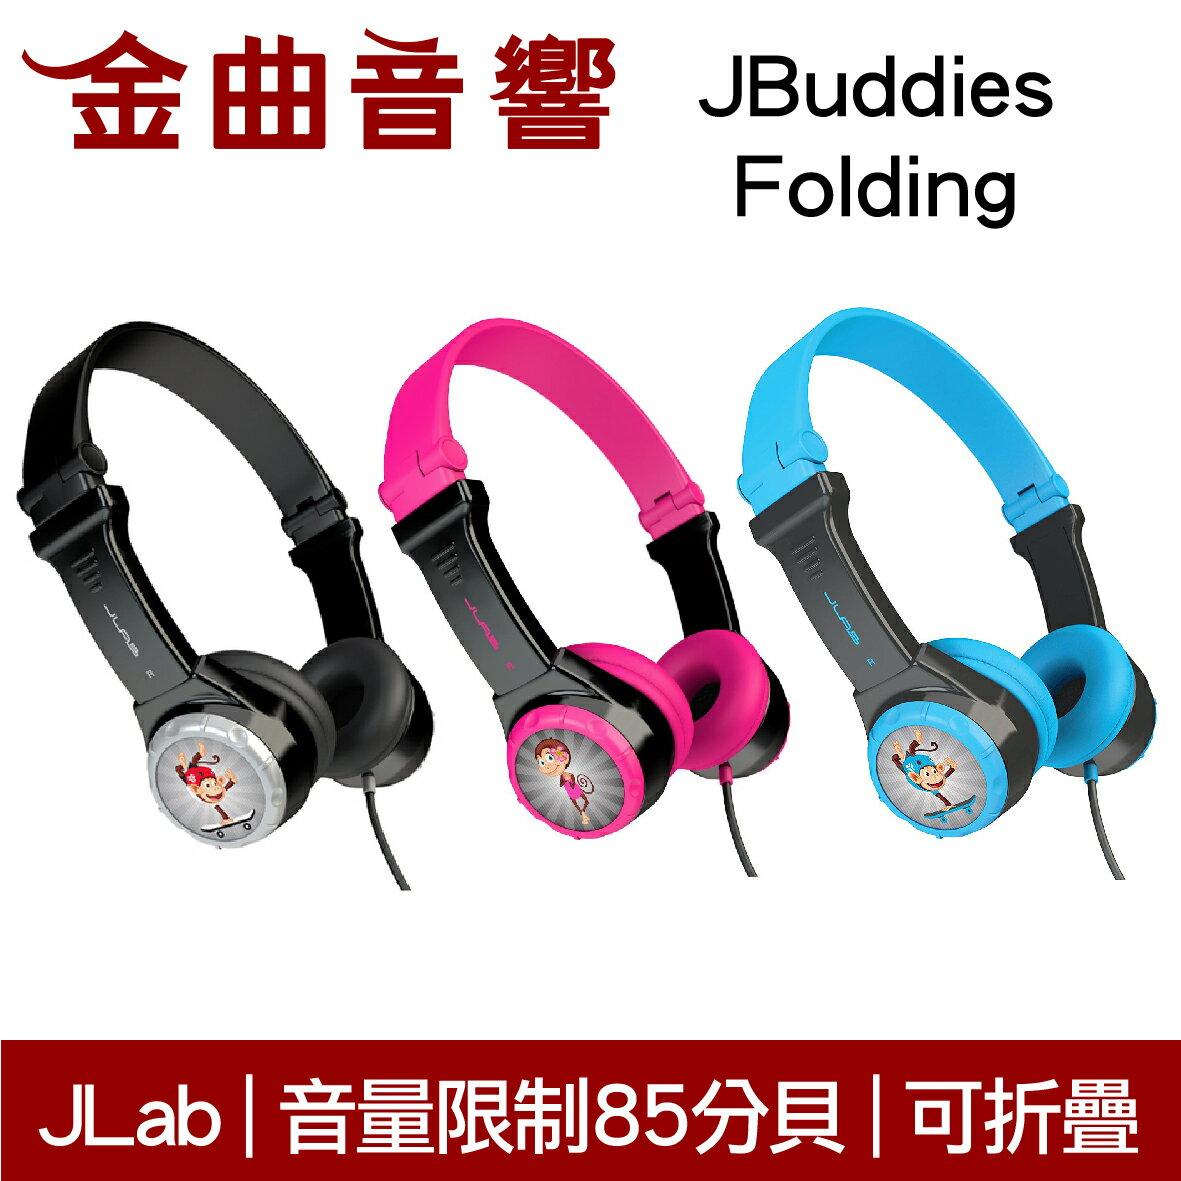 JLab JBuddies Folding 粉色 兒童 耳罩式耳機 | 金曲音響